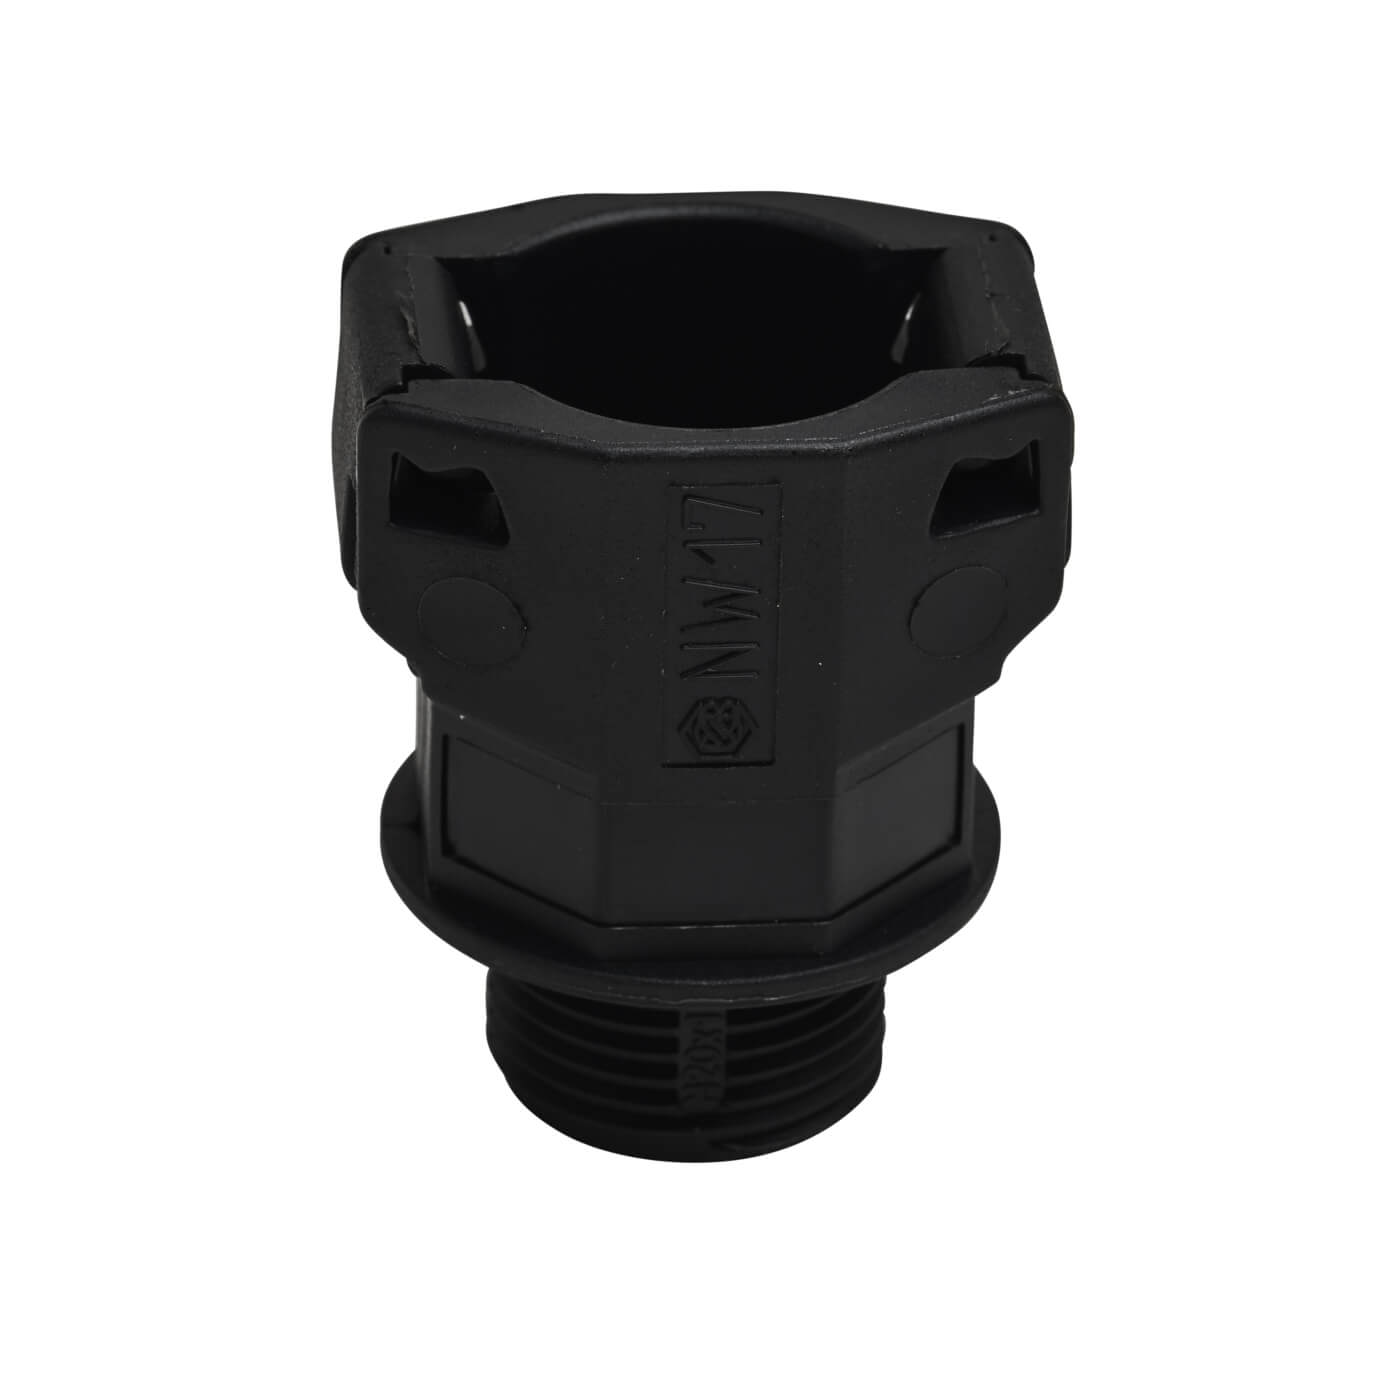 Lsf Flexible Conduit Gland 20mm Black Electricaldirect